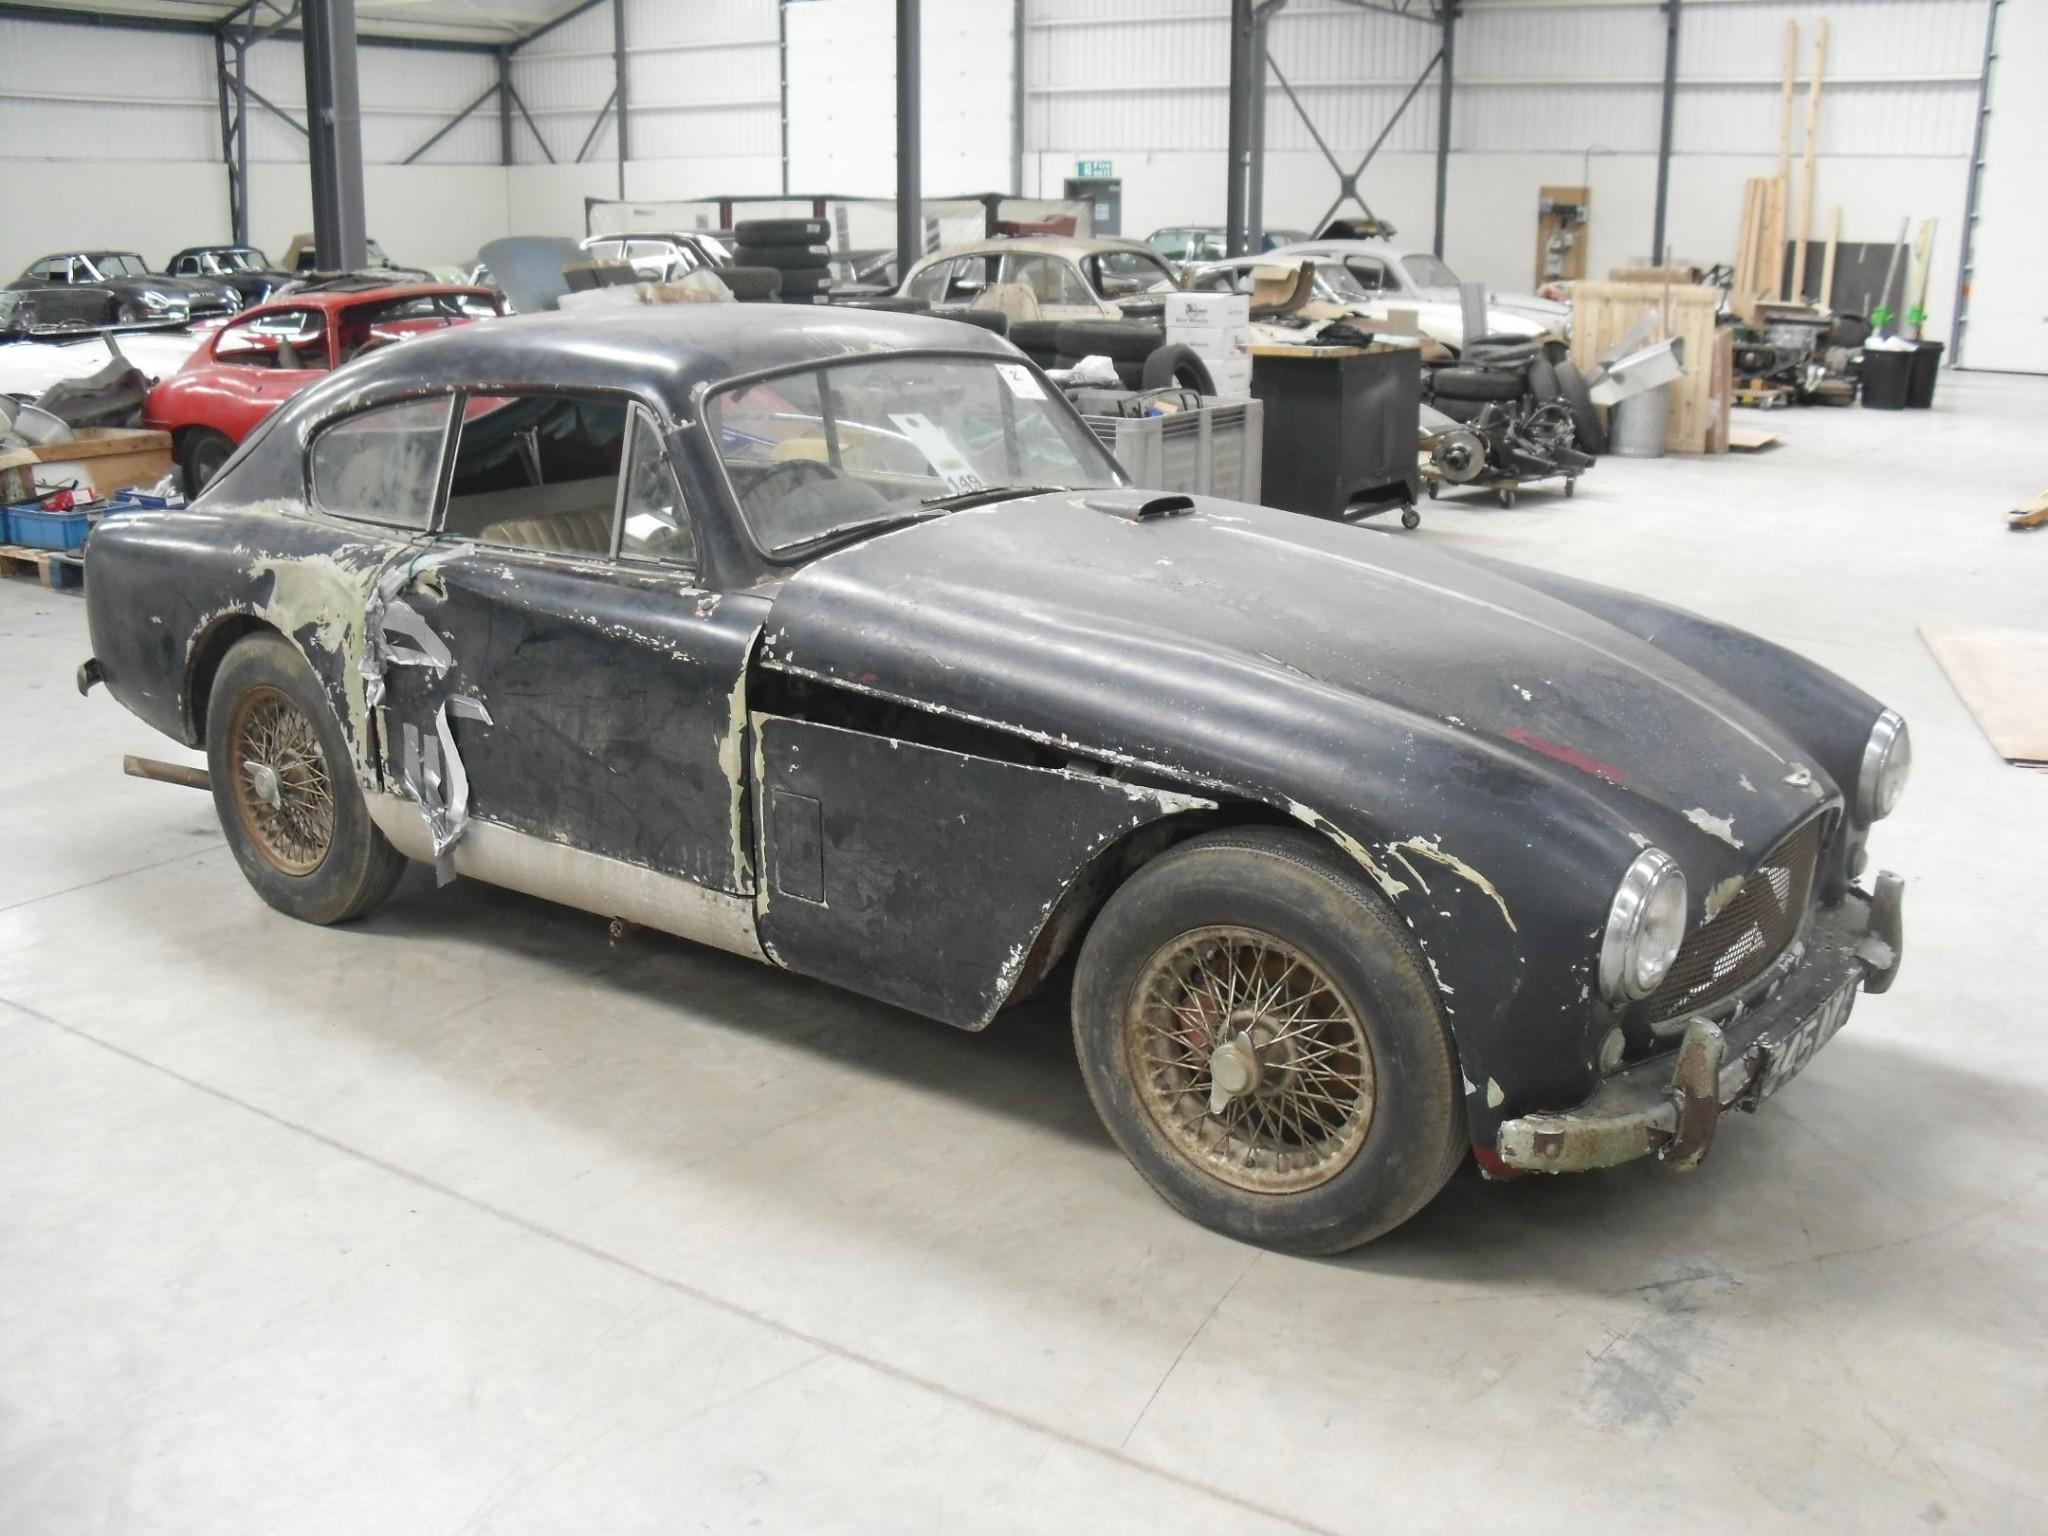 barn find 1958 aston martin db2/4 mark iii to begin restoration